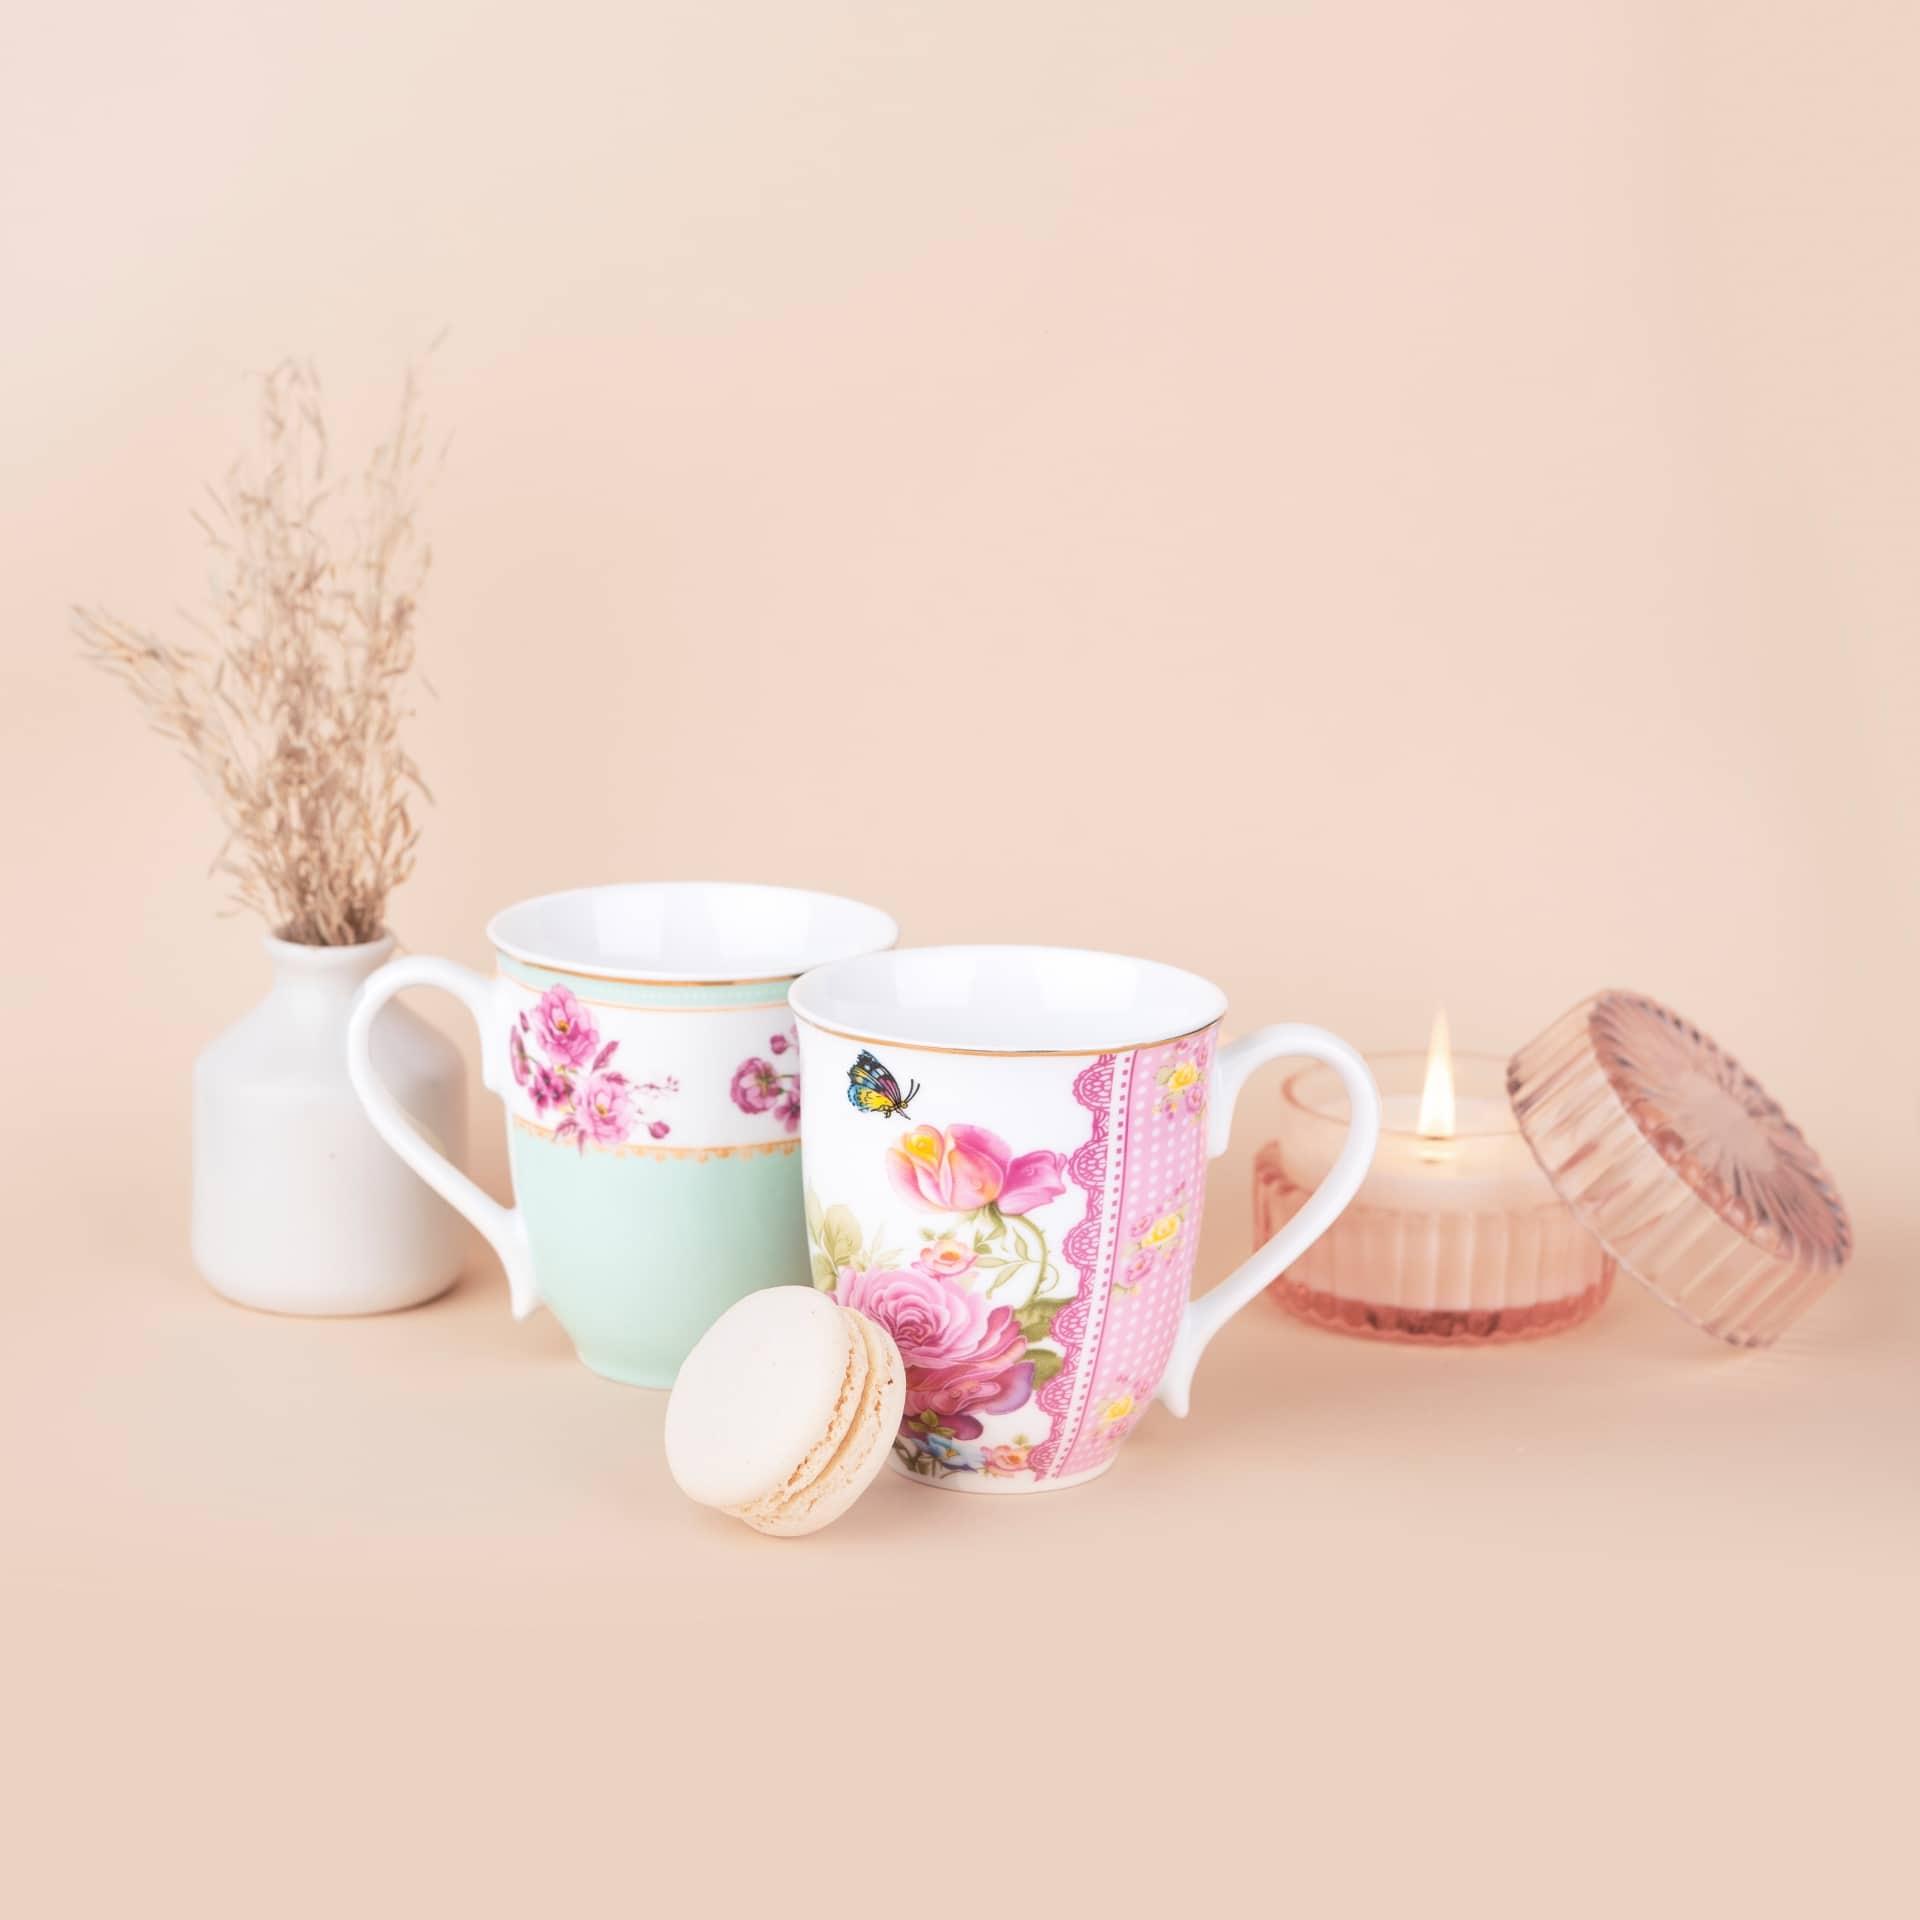 Viola Signature Coffee Mug Collection Set of 2